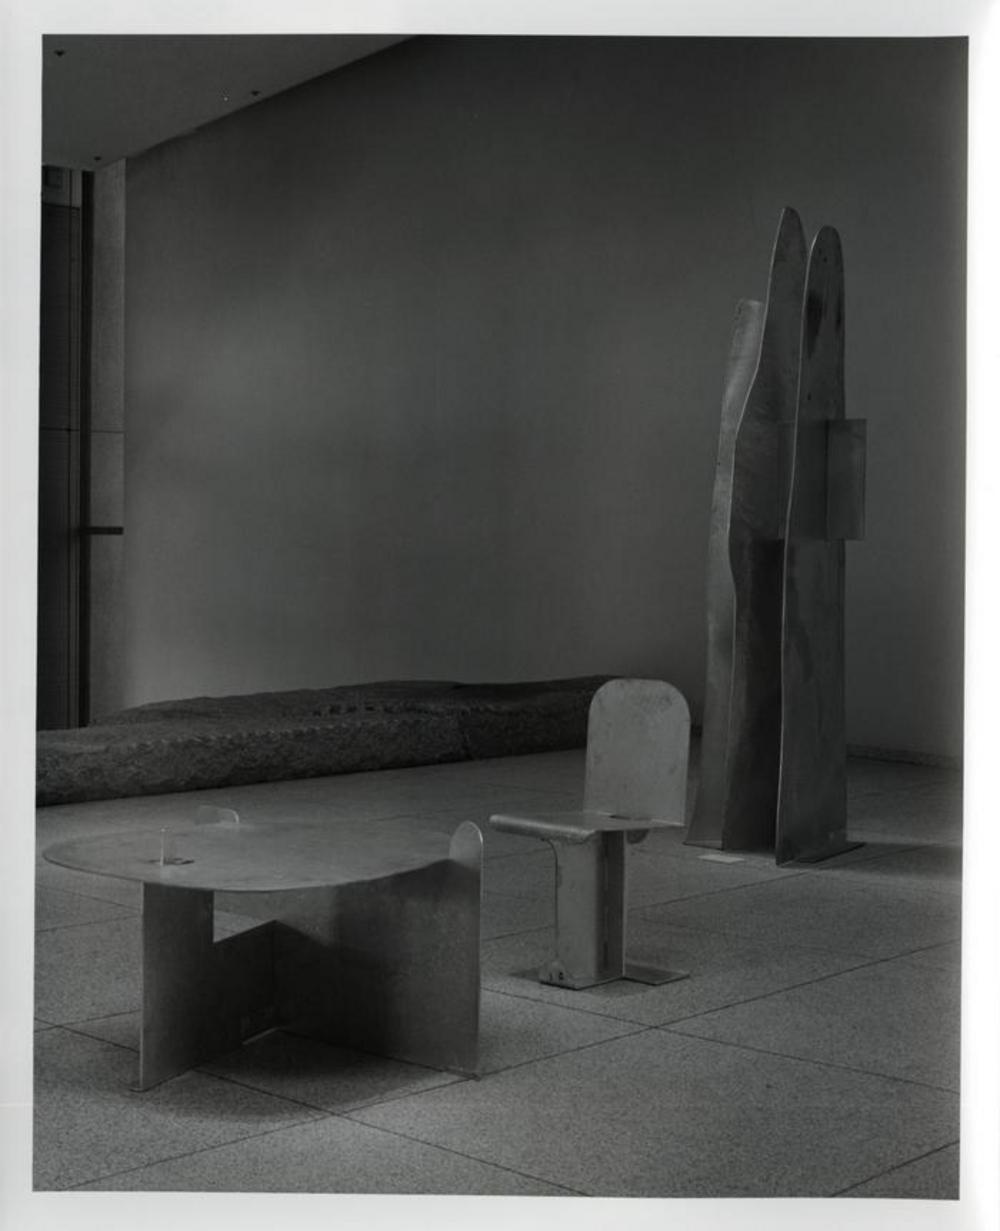 Pierced Seat, image 5